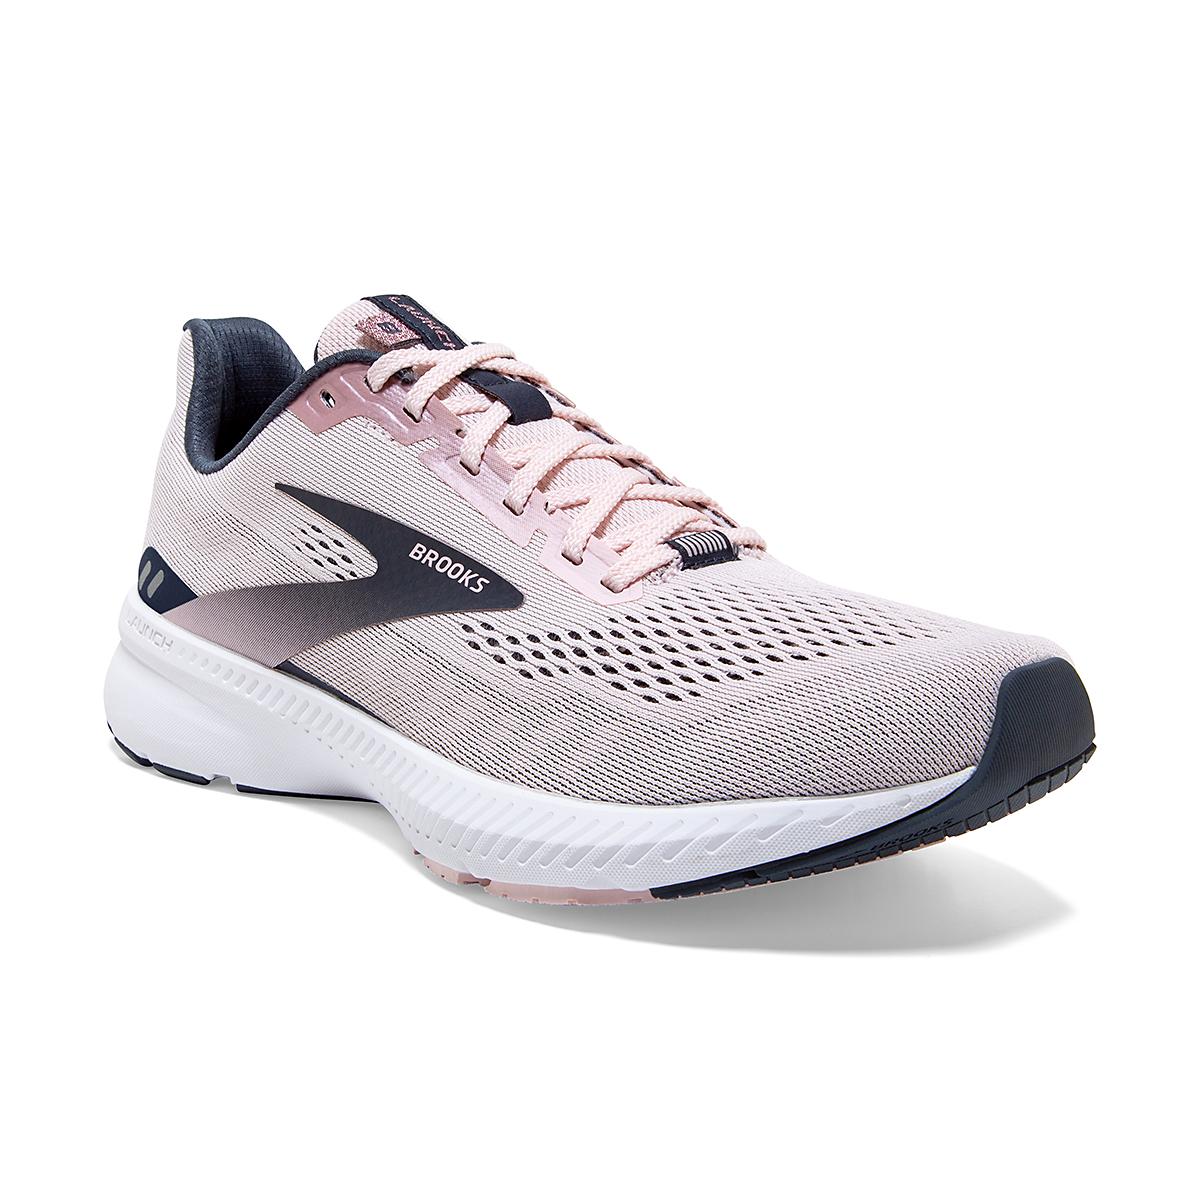 Women's Brooks Launch 8 Running Shoe - Color: Primrose/Ombre/Metallic - Size: 5 - Width: Regular, Primrose/Ombre/Metallic, large, image 2